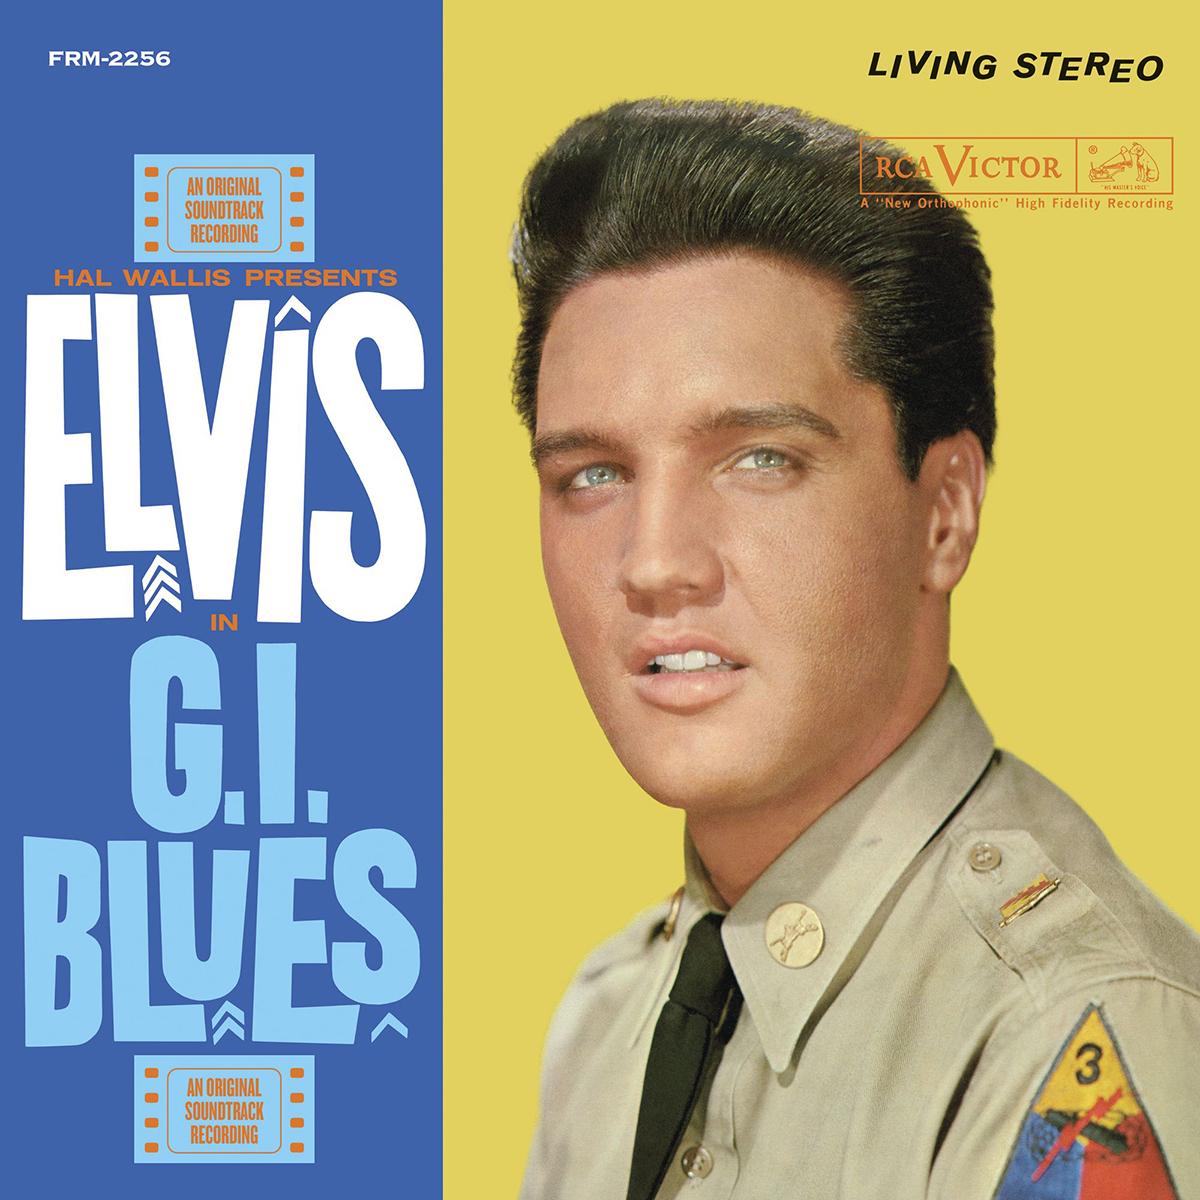 Elvis Presley - G.I. BLUES 180 GRAM YELLOW AUDIOPHILE VINYL/LIMITED ANNIVERSARY EDITION LP